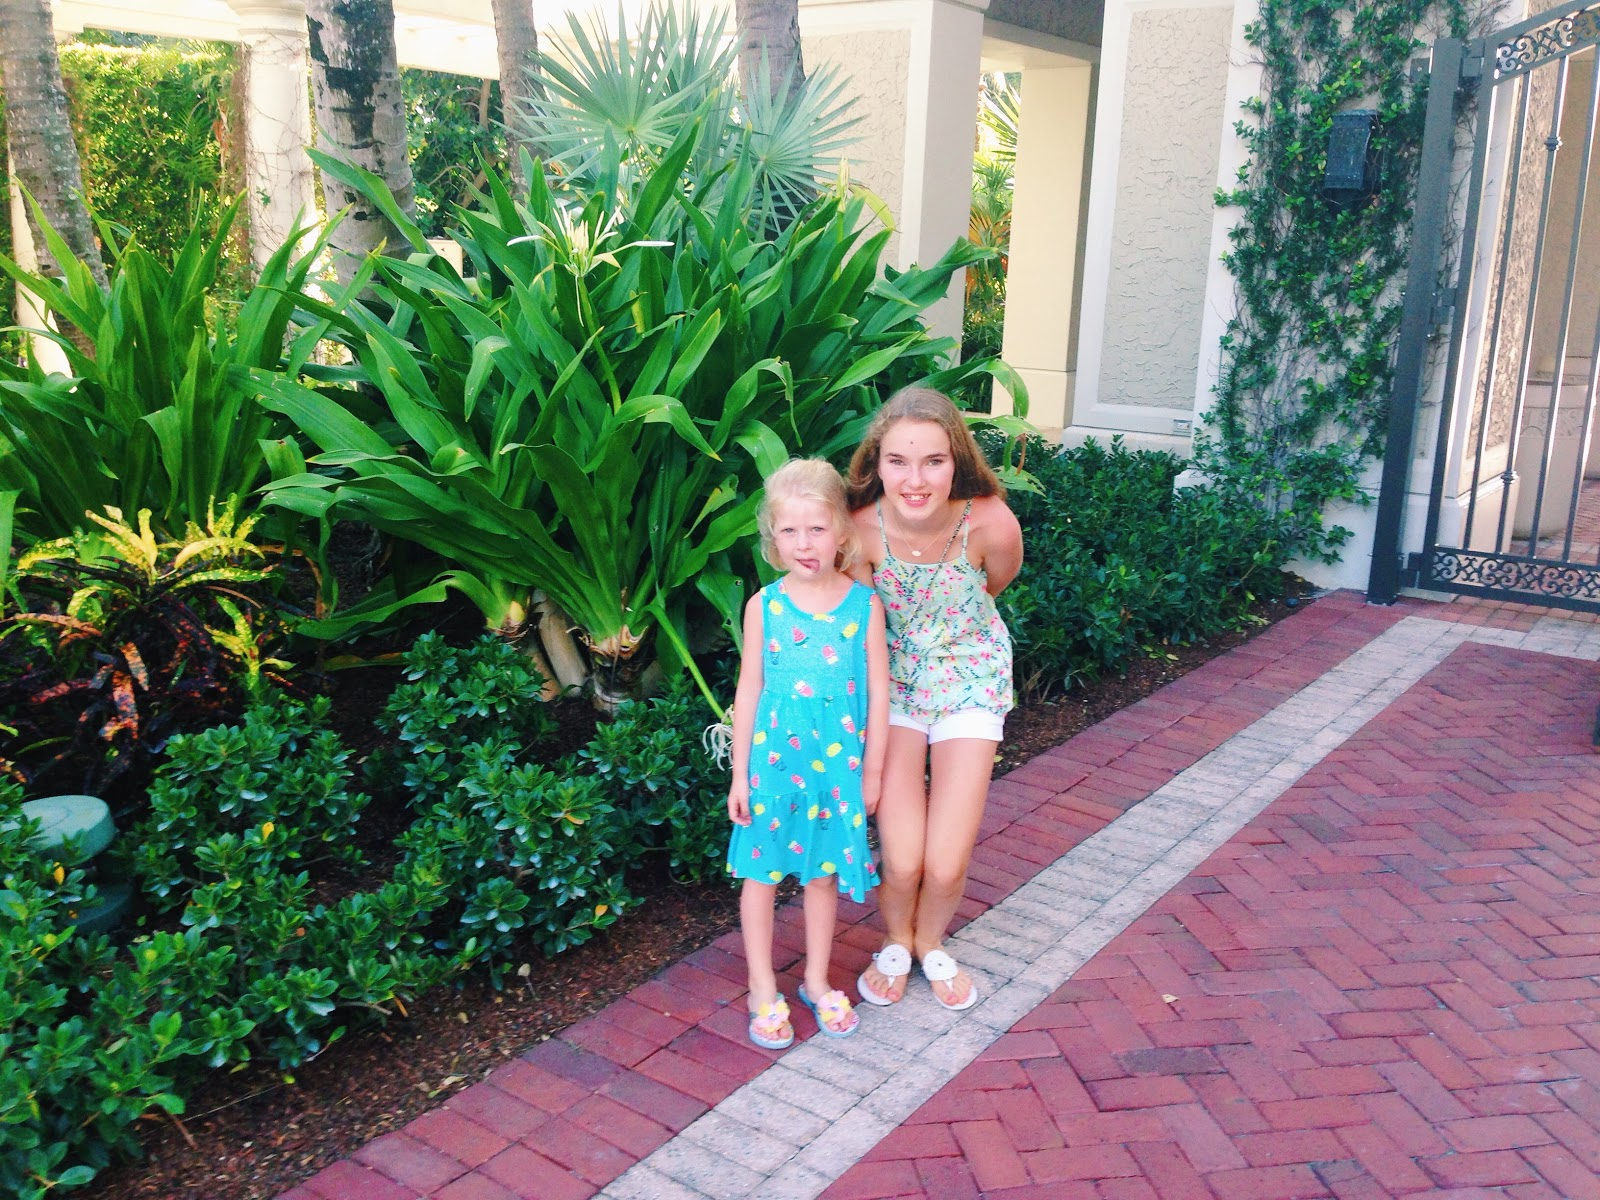 LIVE THE PREP LIFE: Palm Beach Travel Guide